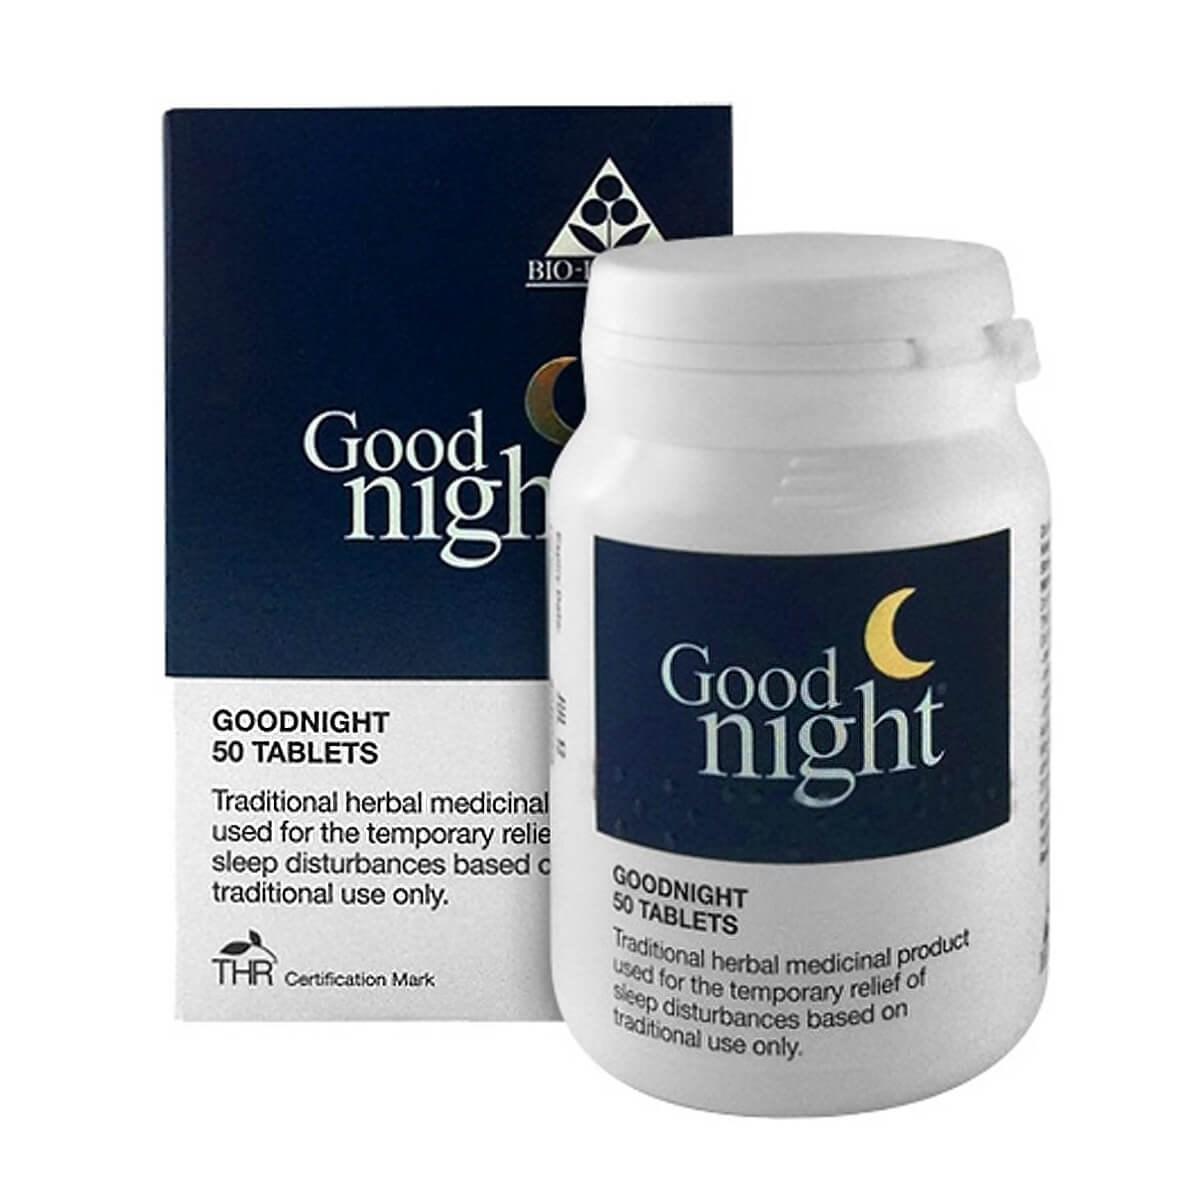 Bio-Health Good Night Herbal Tablets